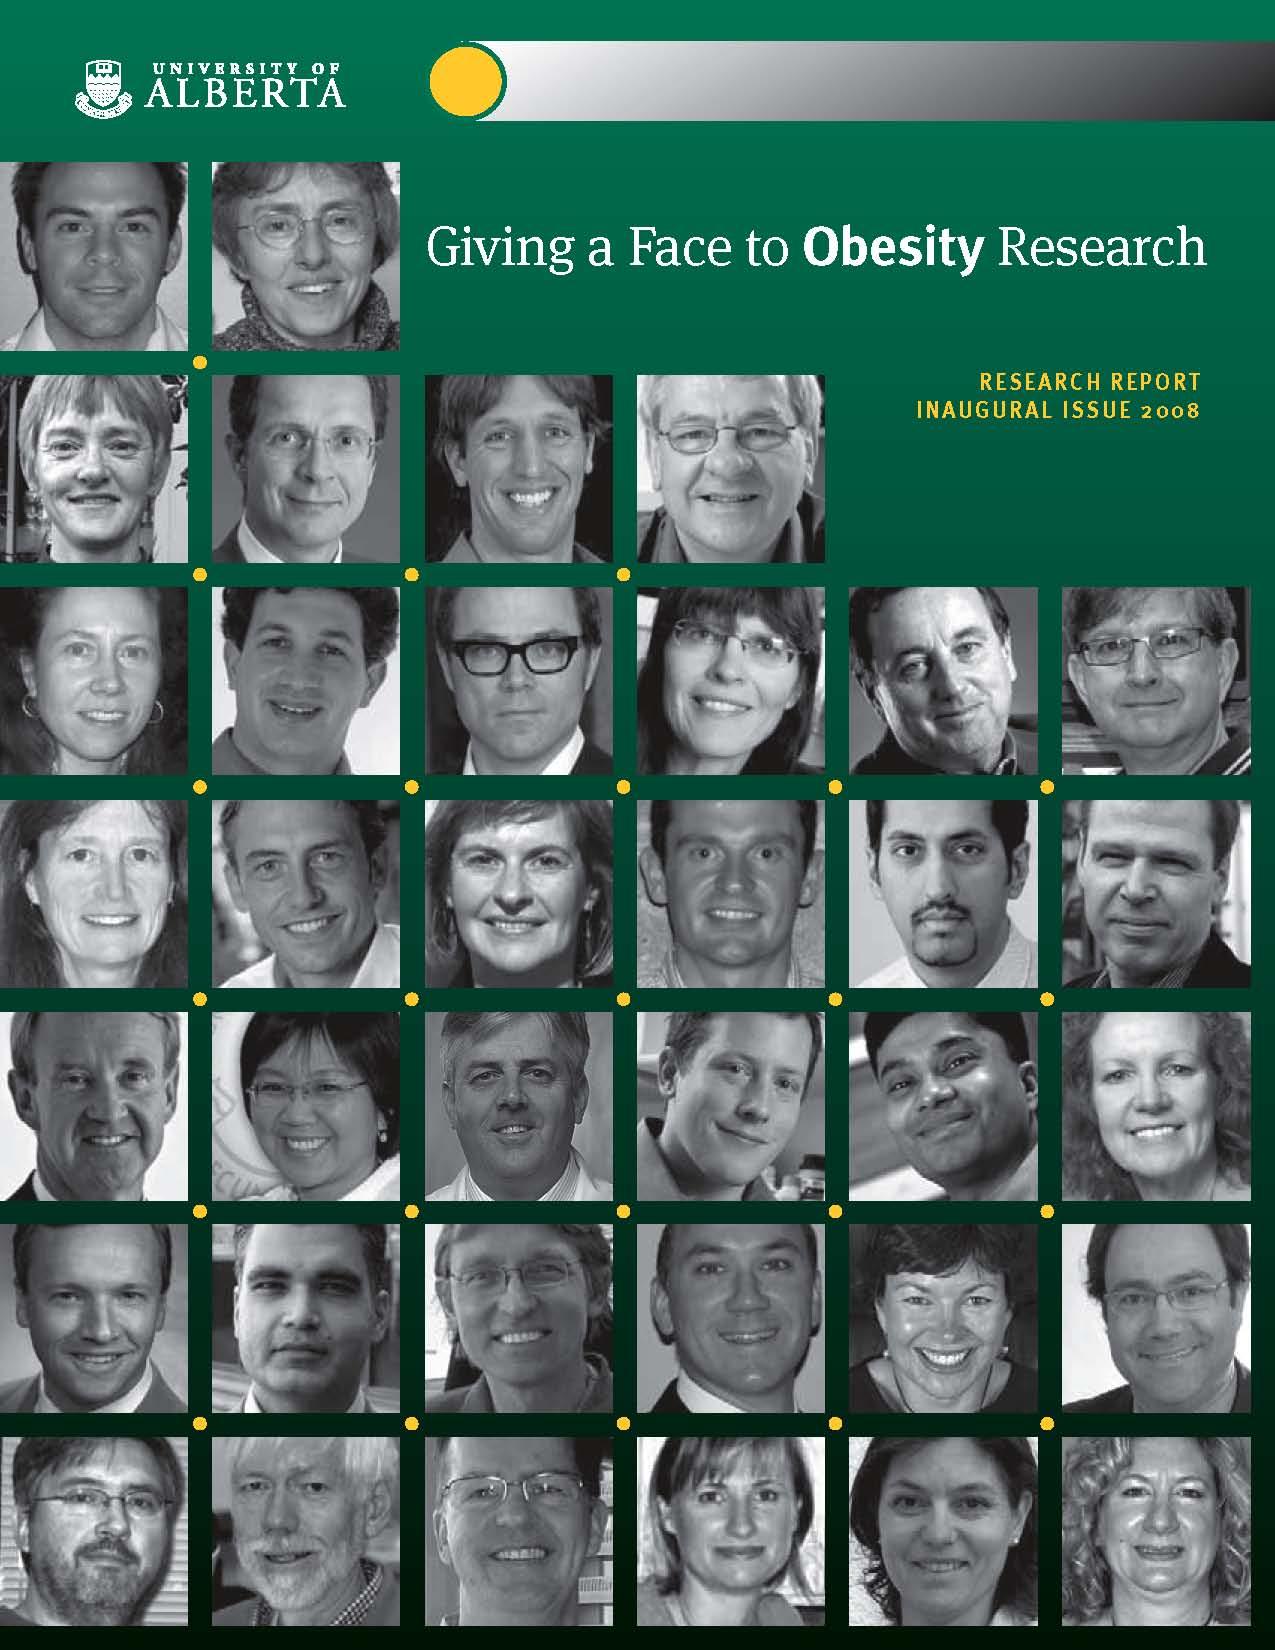 University of Alberta Obesity Research Report